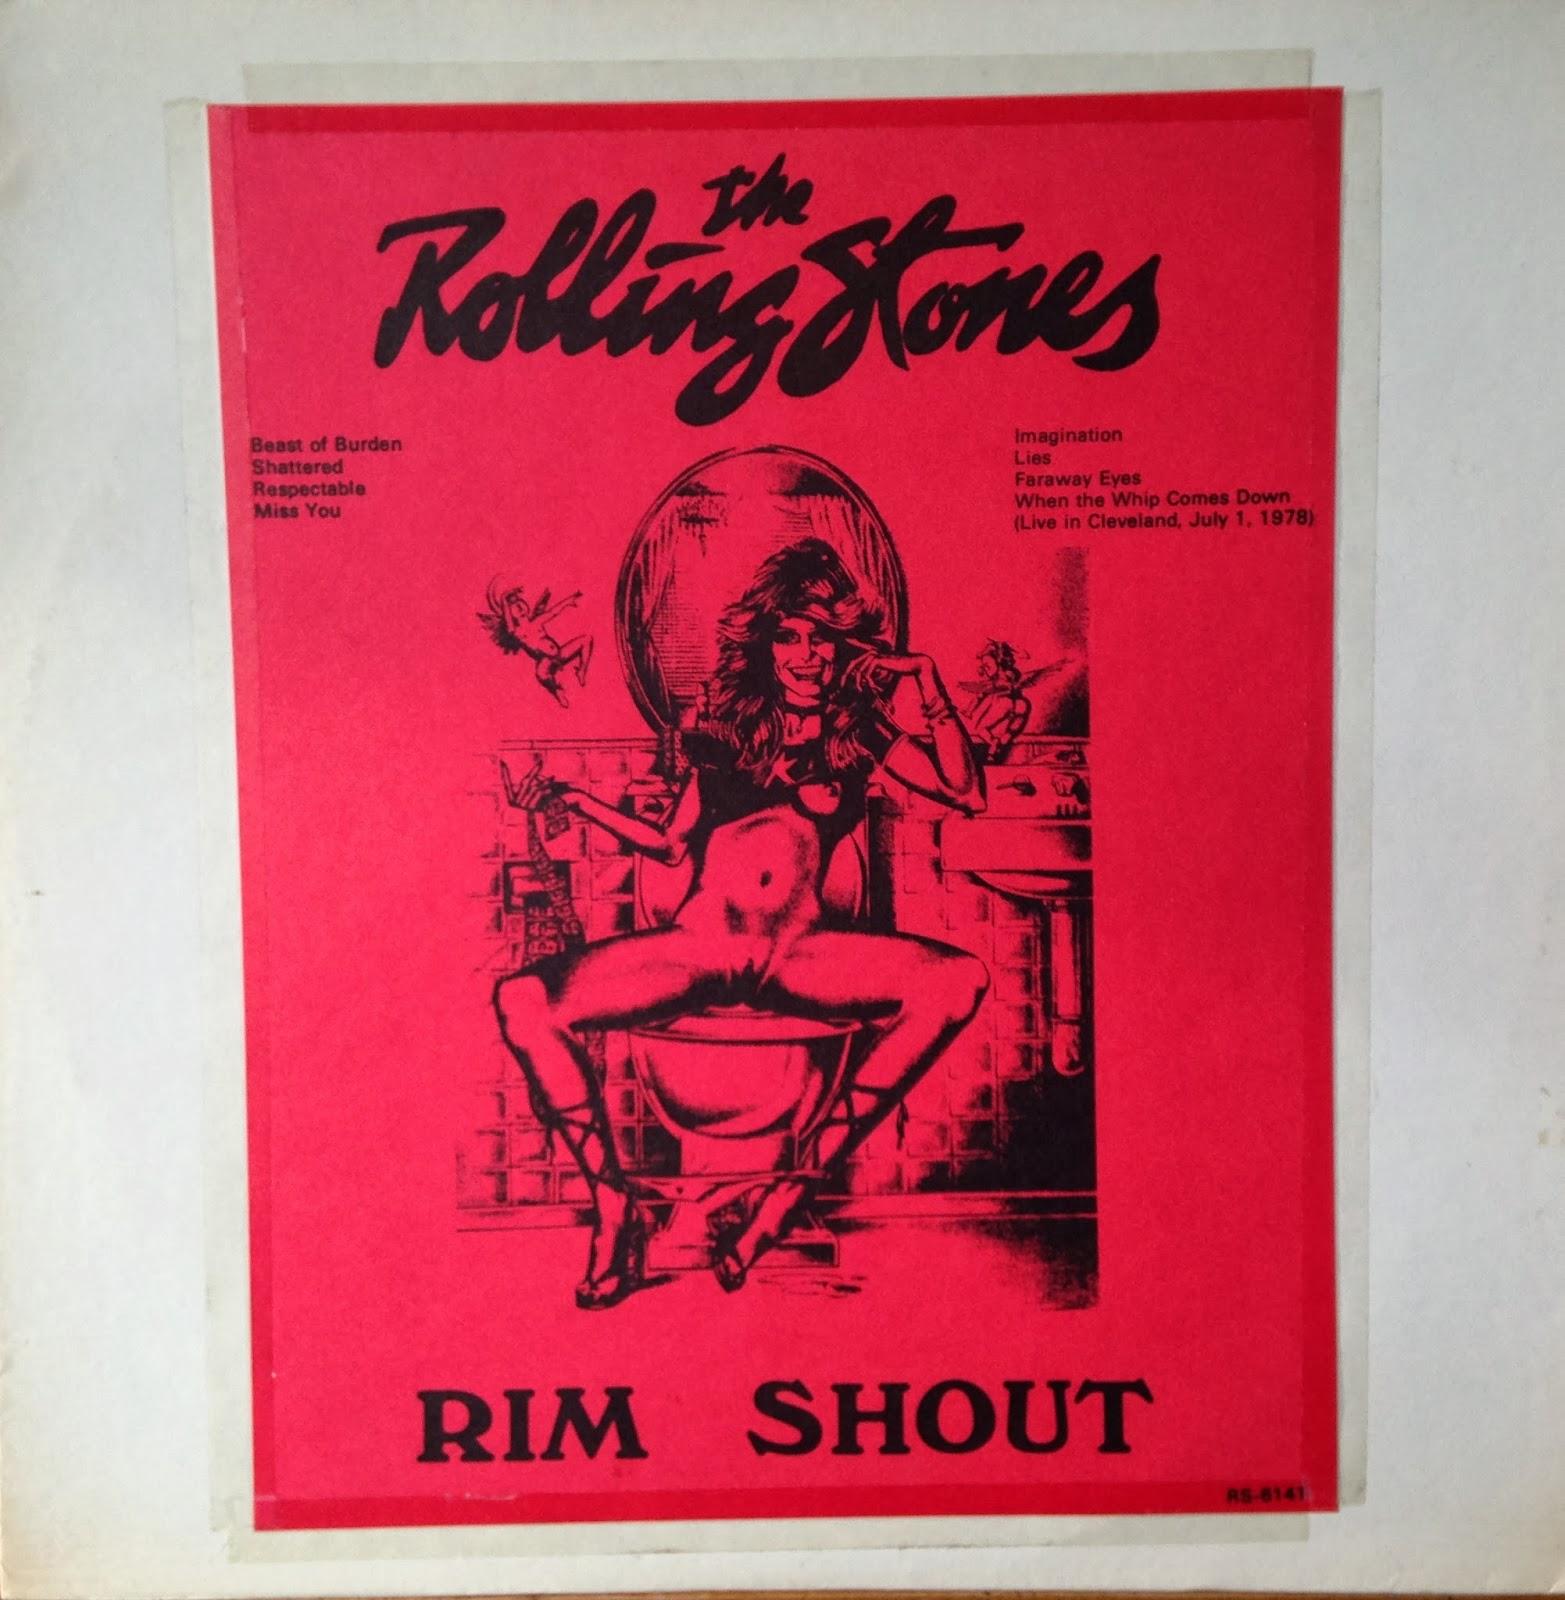 Ed S Attic Rim Shout The Rolling Stones